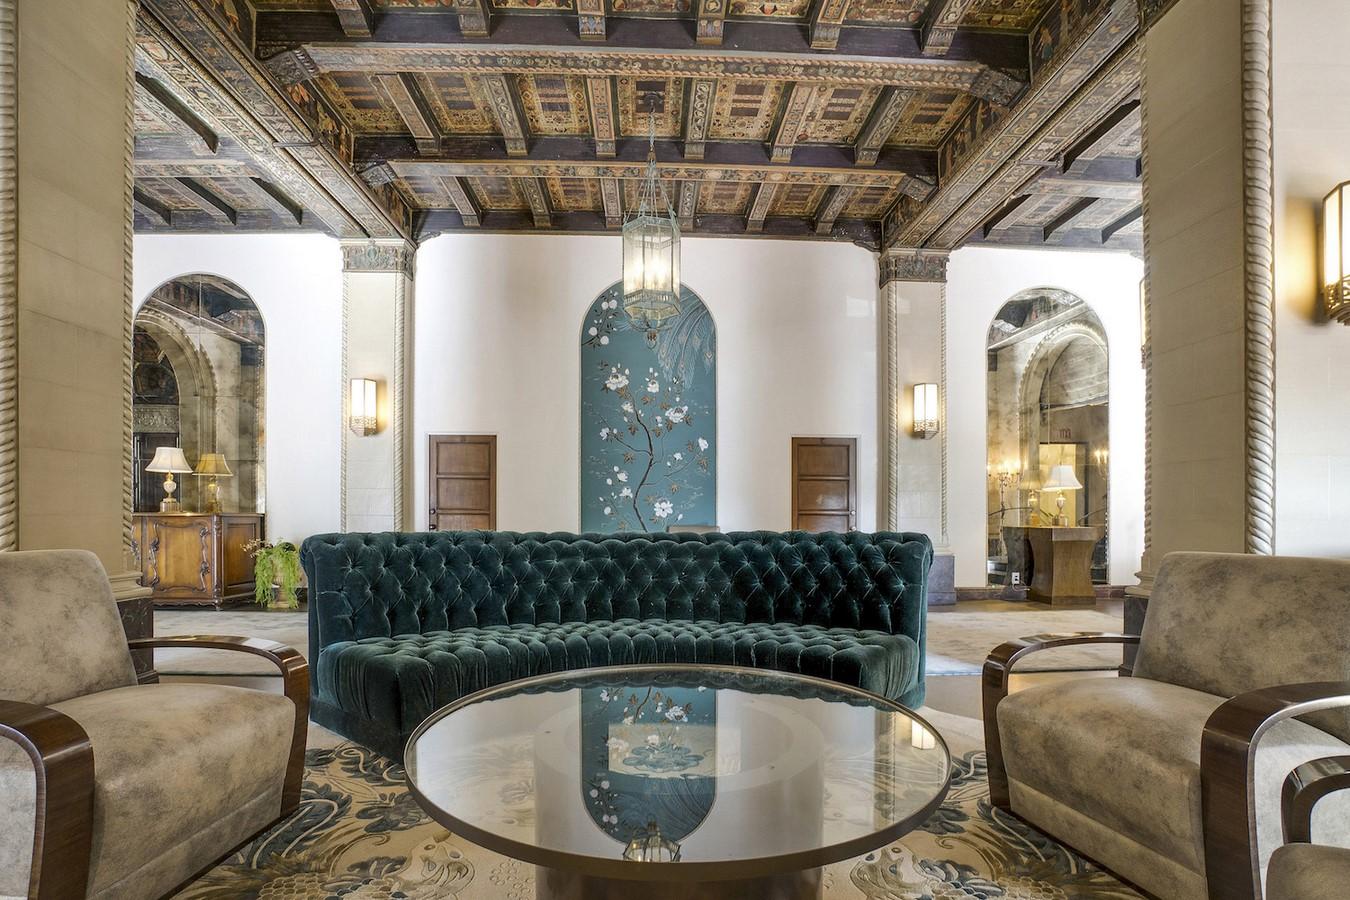 15 beautiful vintage apartments around the world - Sheet18